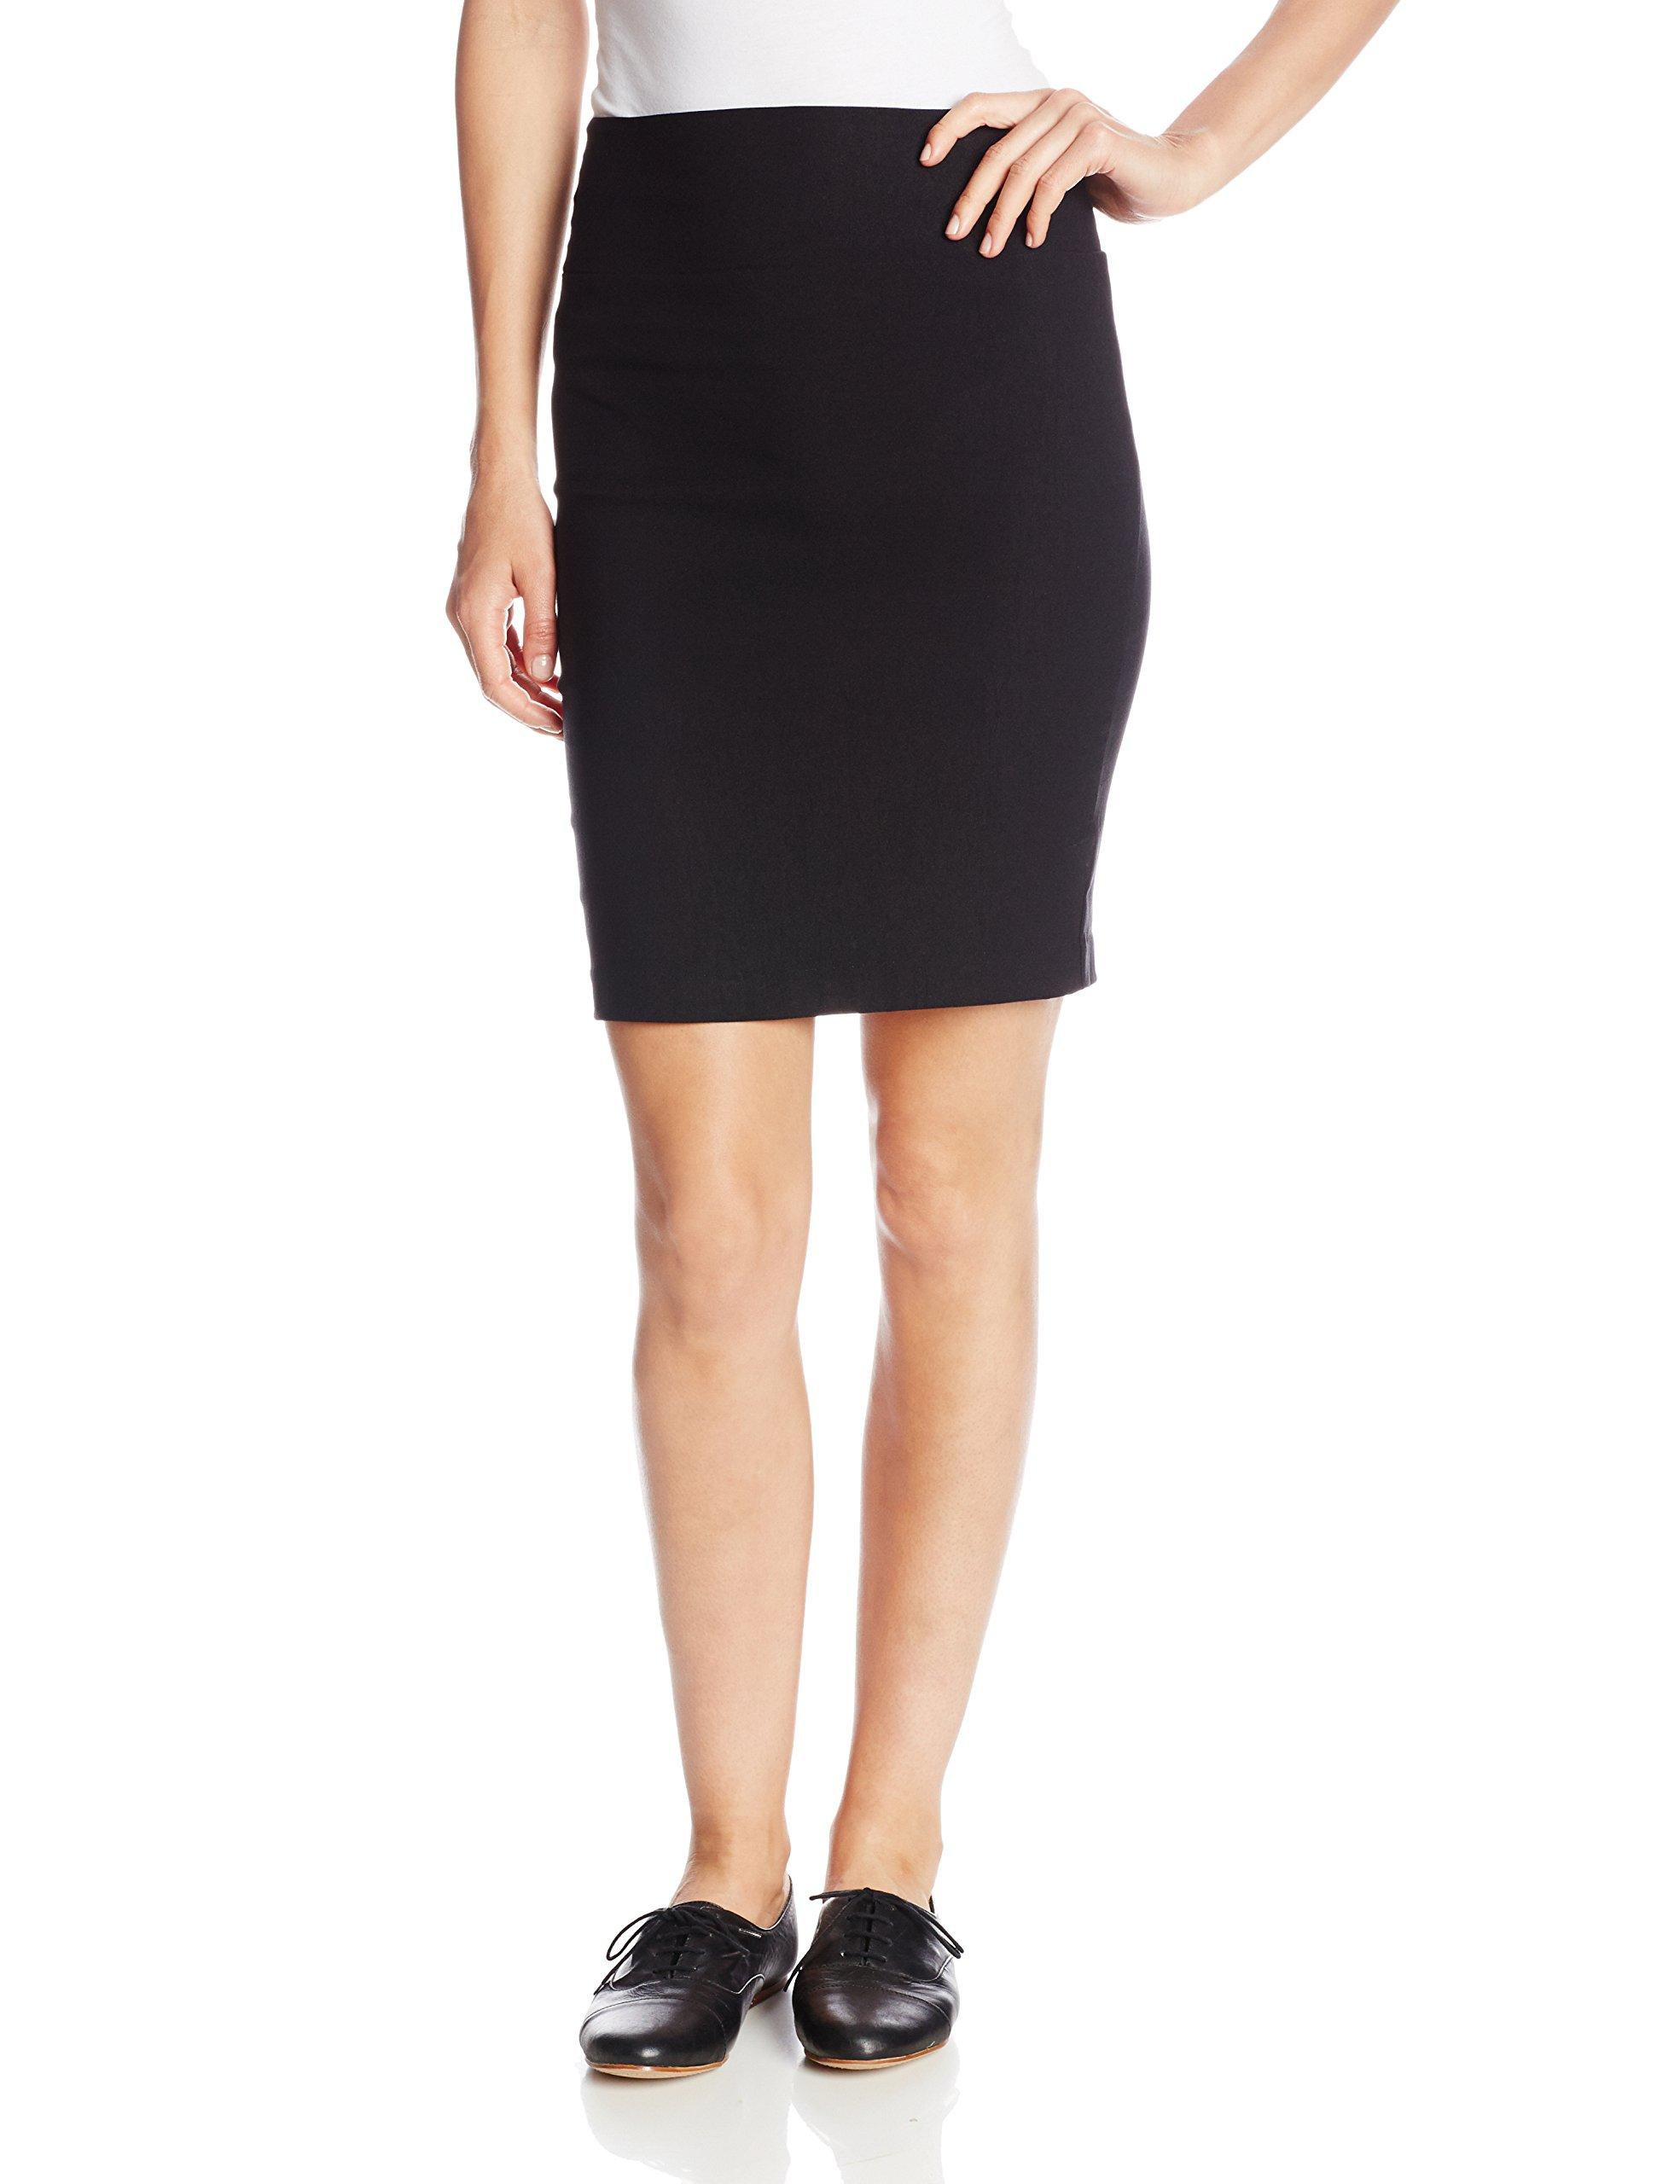 A. Byer Juniors Pull-On Slim Fitting Pencil Skirt, Black, Large